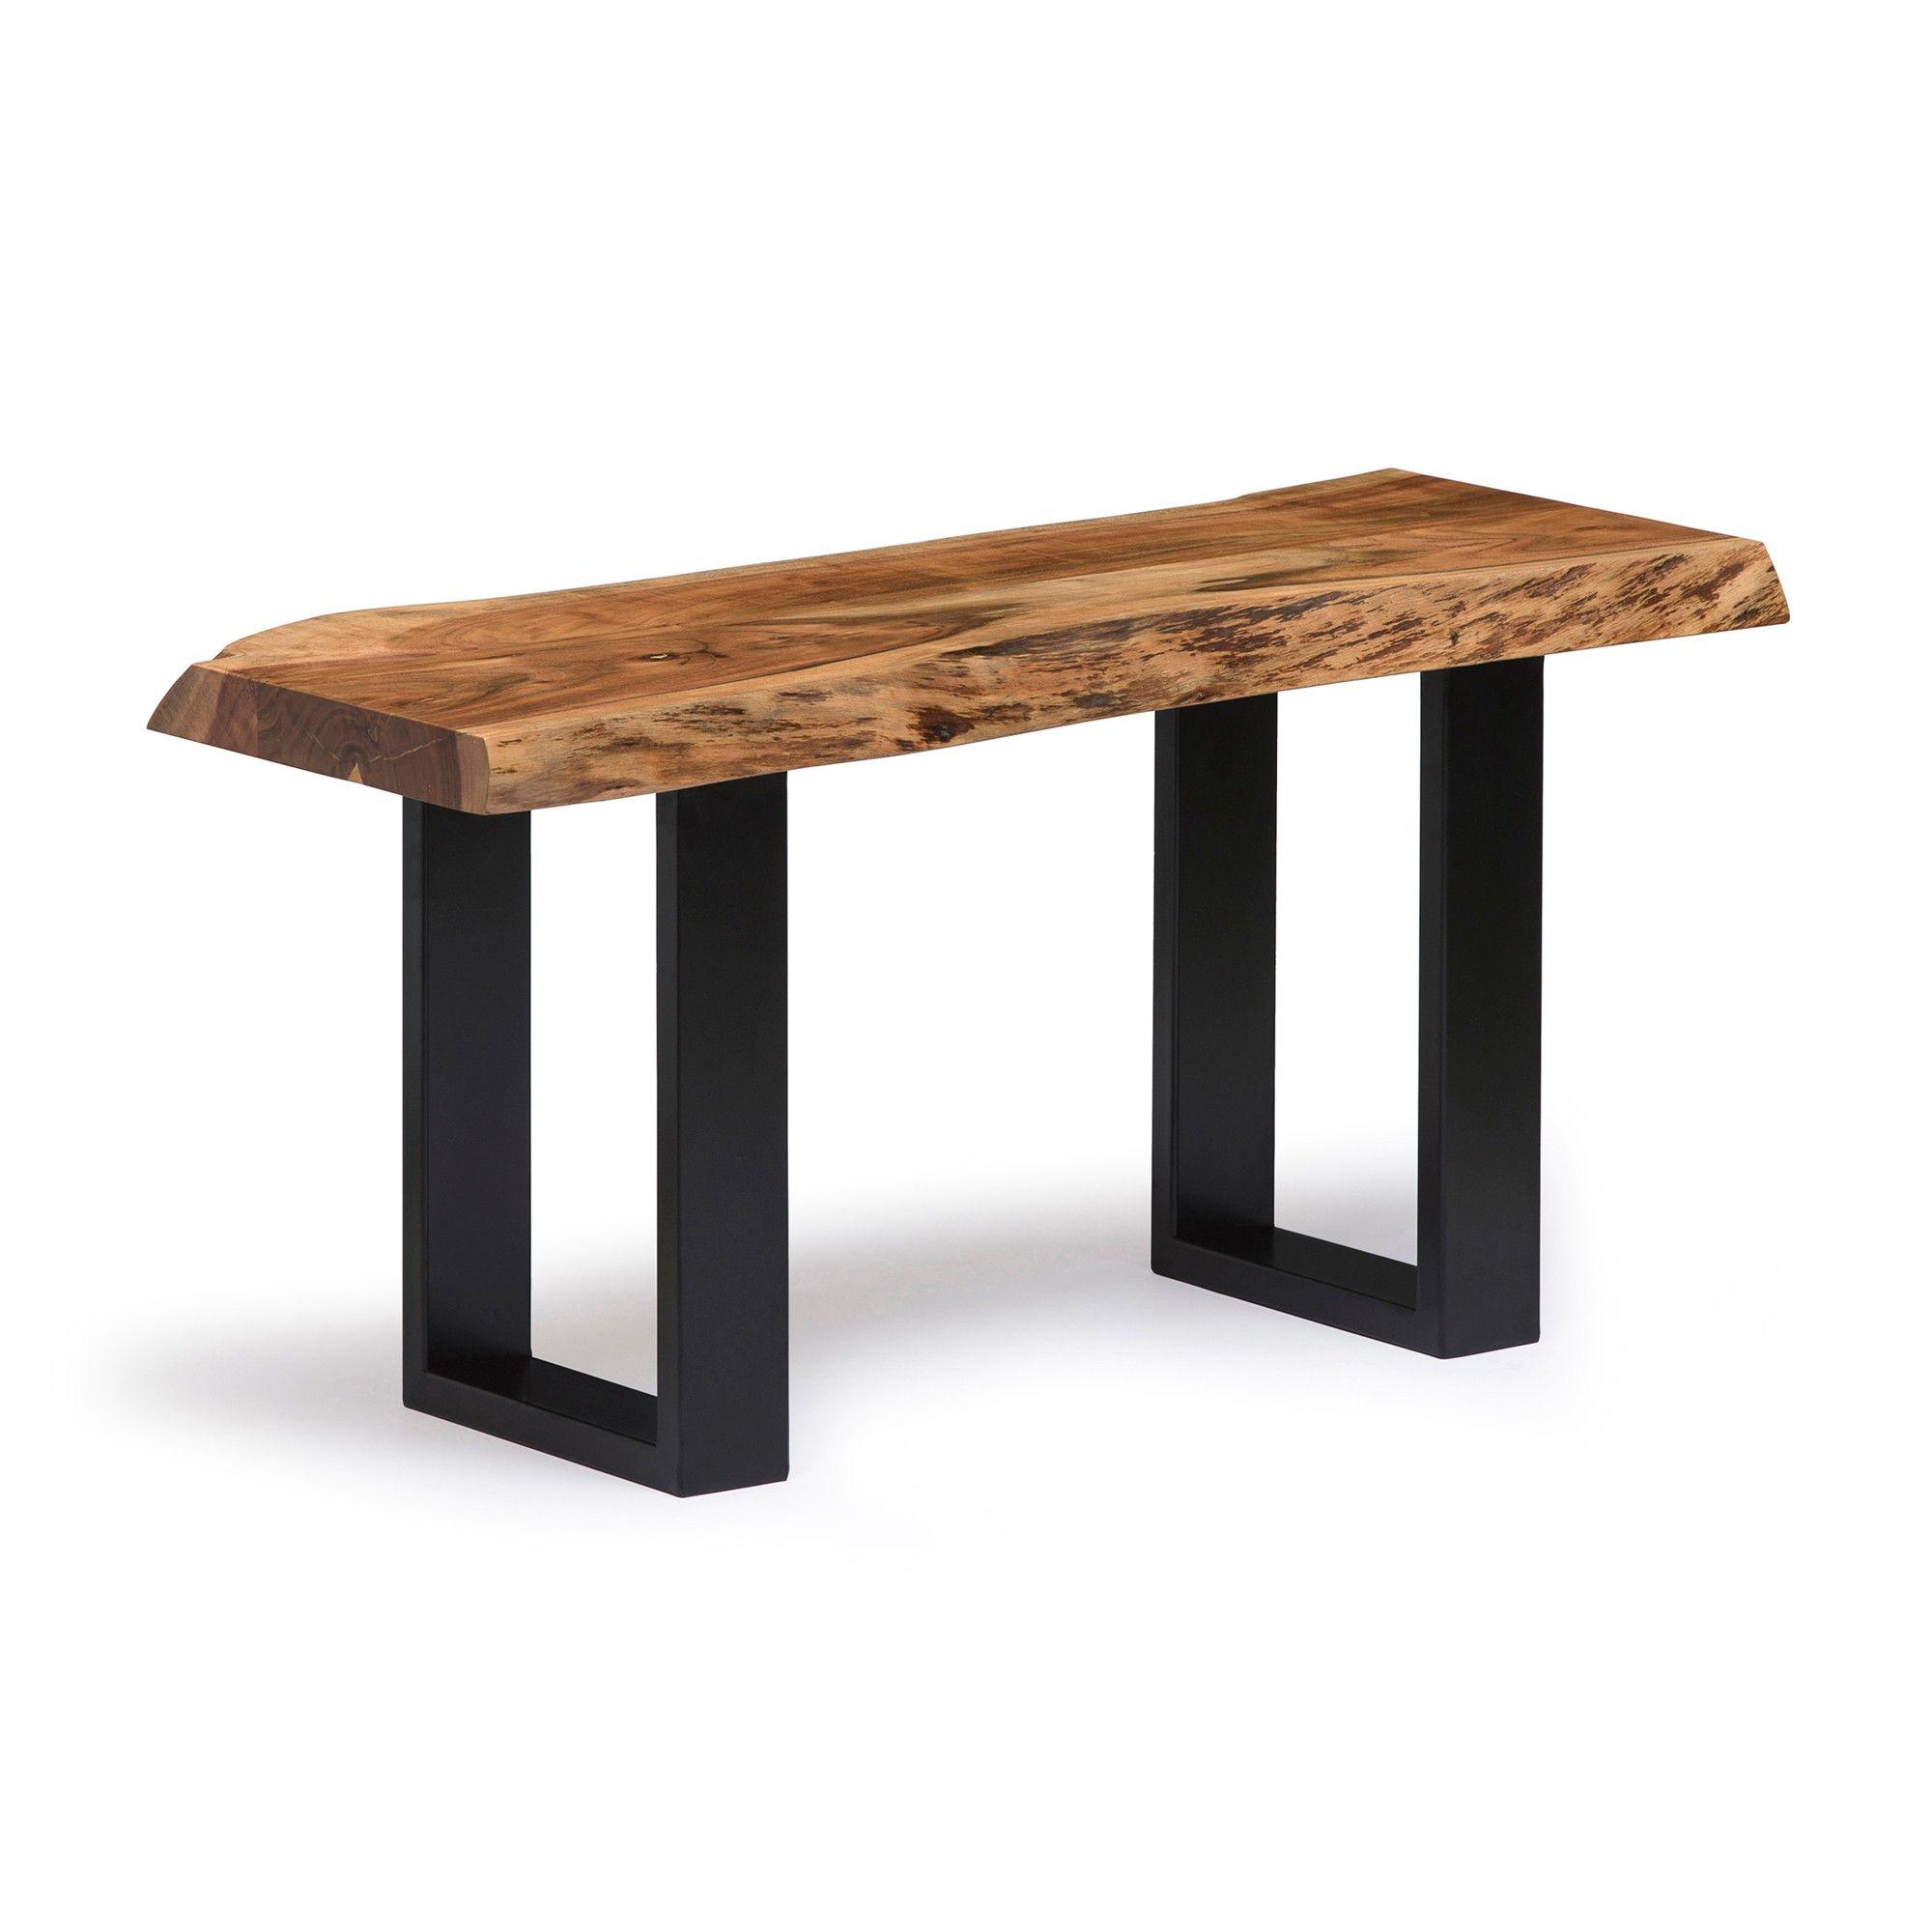 Alaterre Furniture Alpine Natural Brown Live Edge 36 Bench Metal